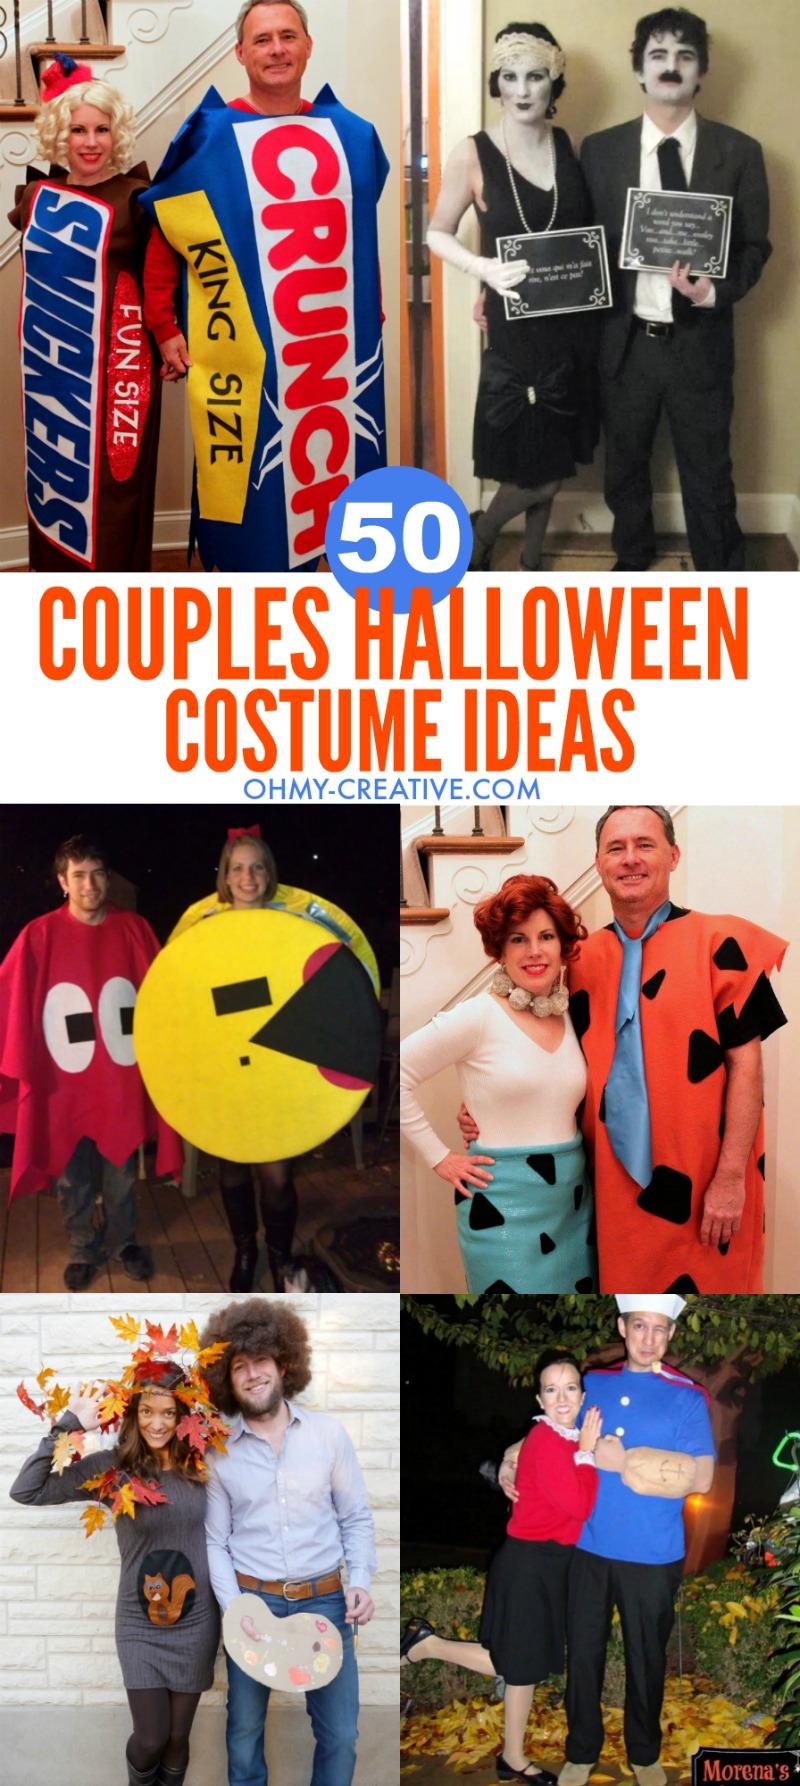 50 Couples Halloween Costume Ideas | OHMY-CREATIVE.COM | Halloween Costumes for Couples | Couples Costumes | Halloween Couple Costumes | adult couple halloween costumes | funny couple costumes | couple costume ideas | his and hers halloween costumes | adult couple costumes